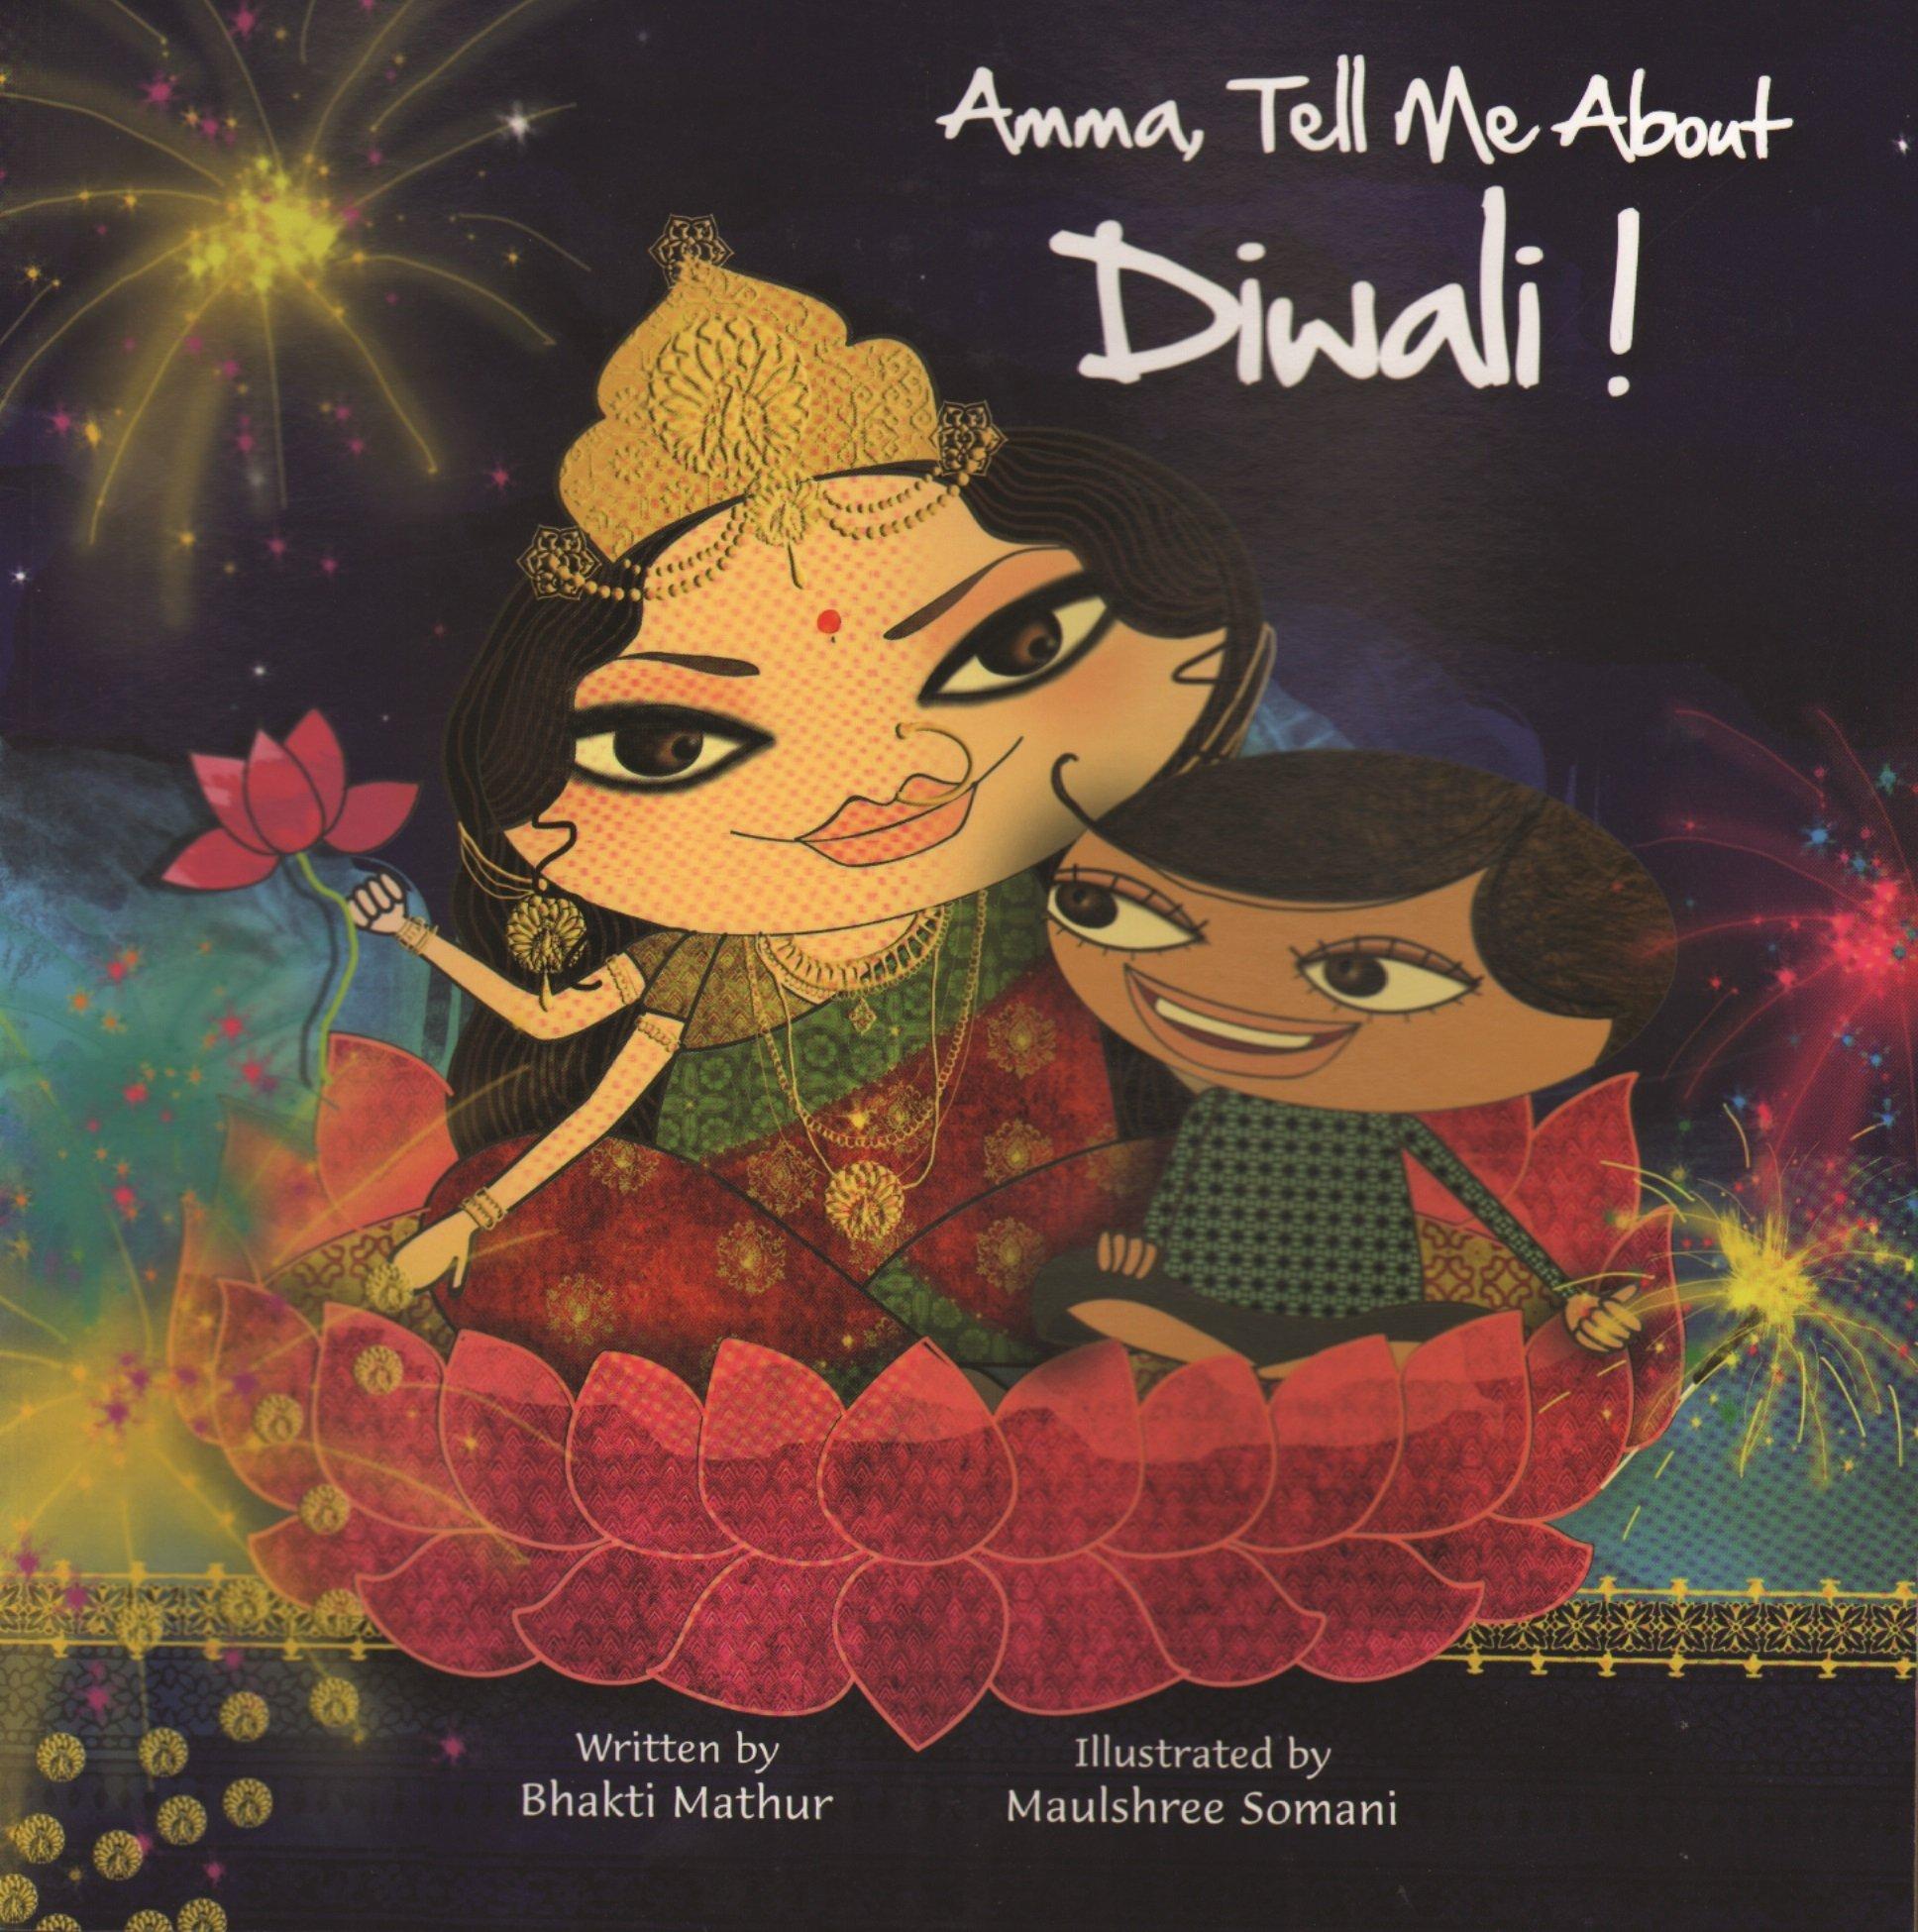 5 Fun Diwali Activities for Kids - 81x4GncdCXL